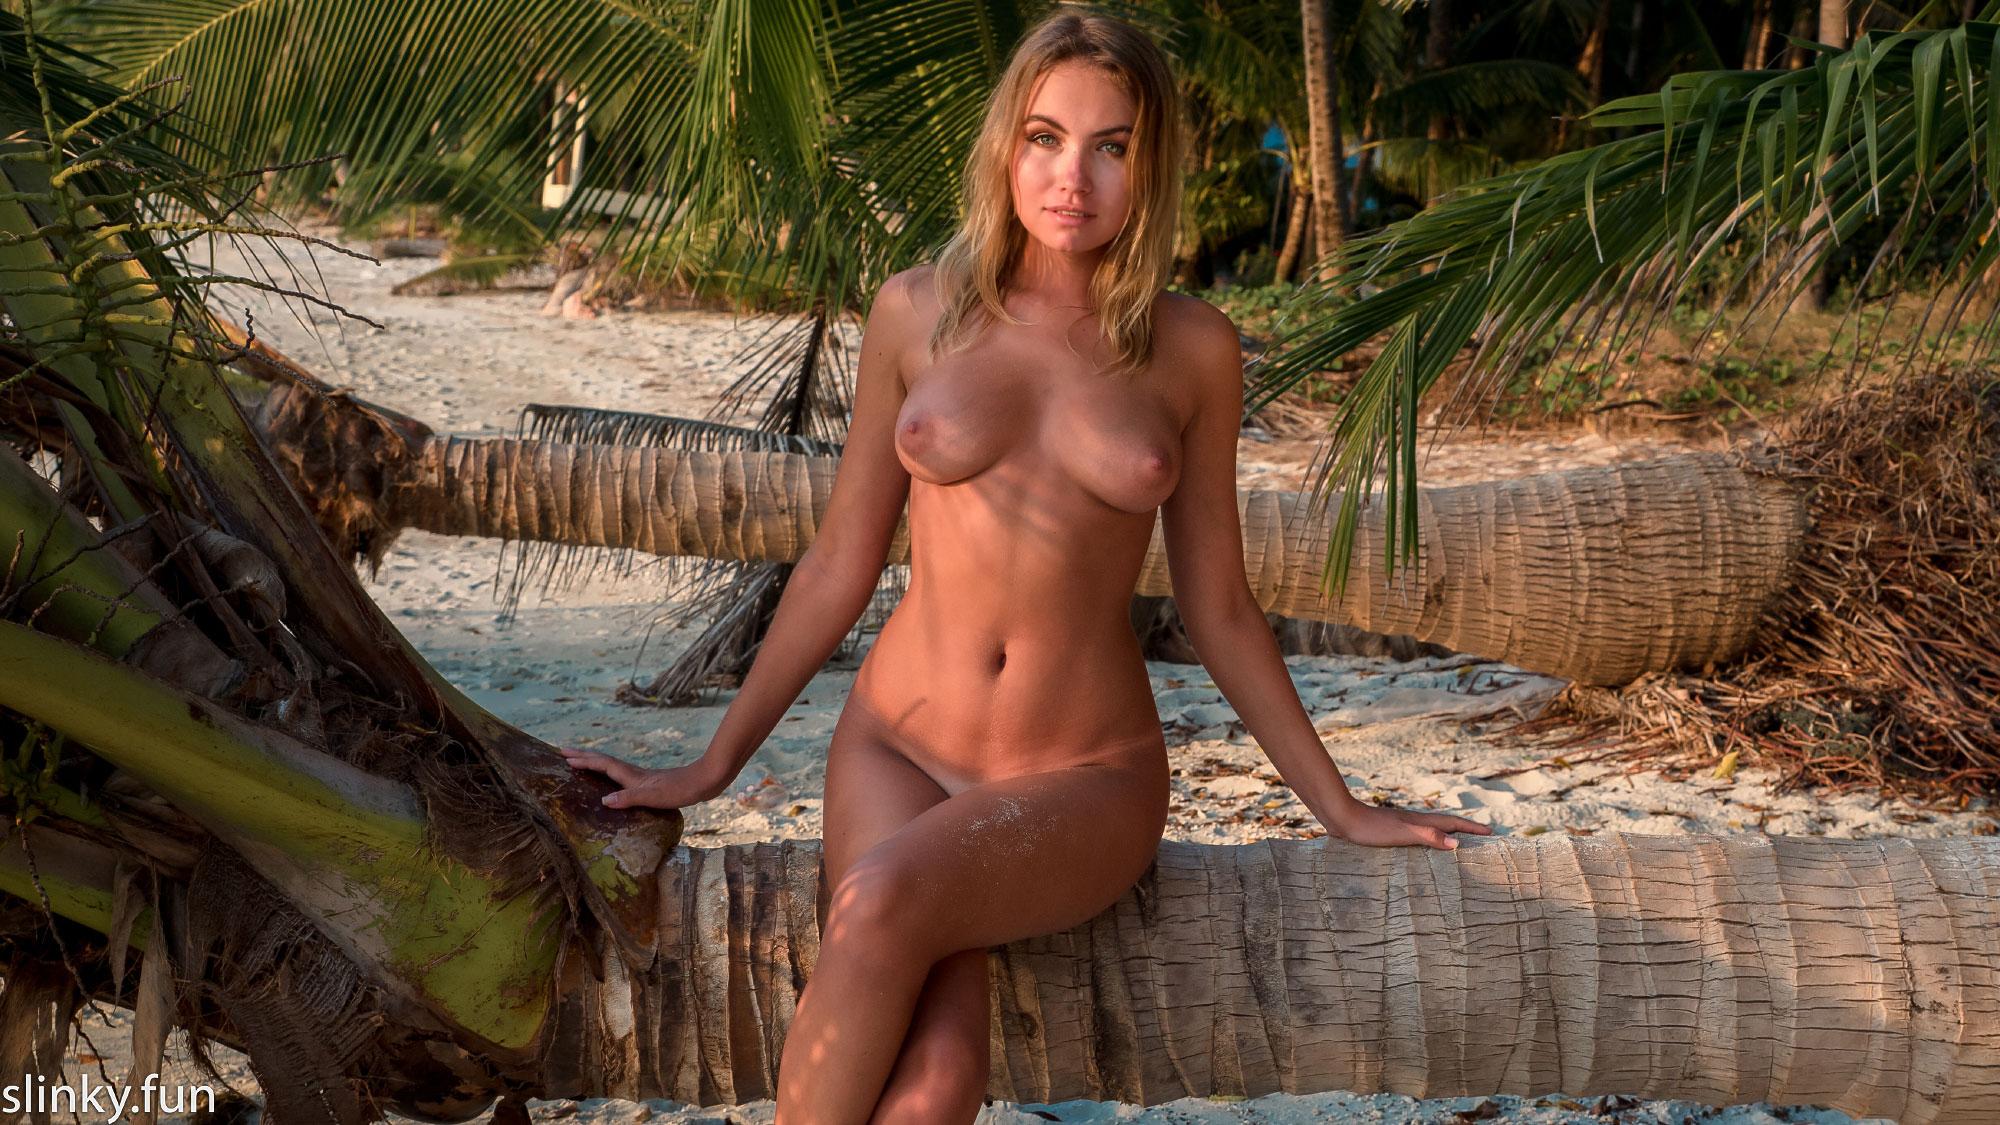 Model nicole nude